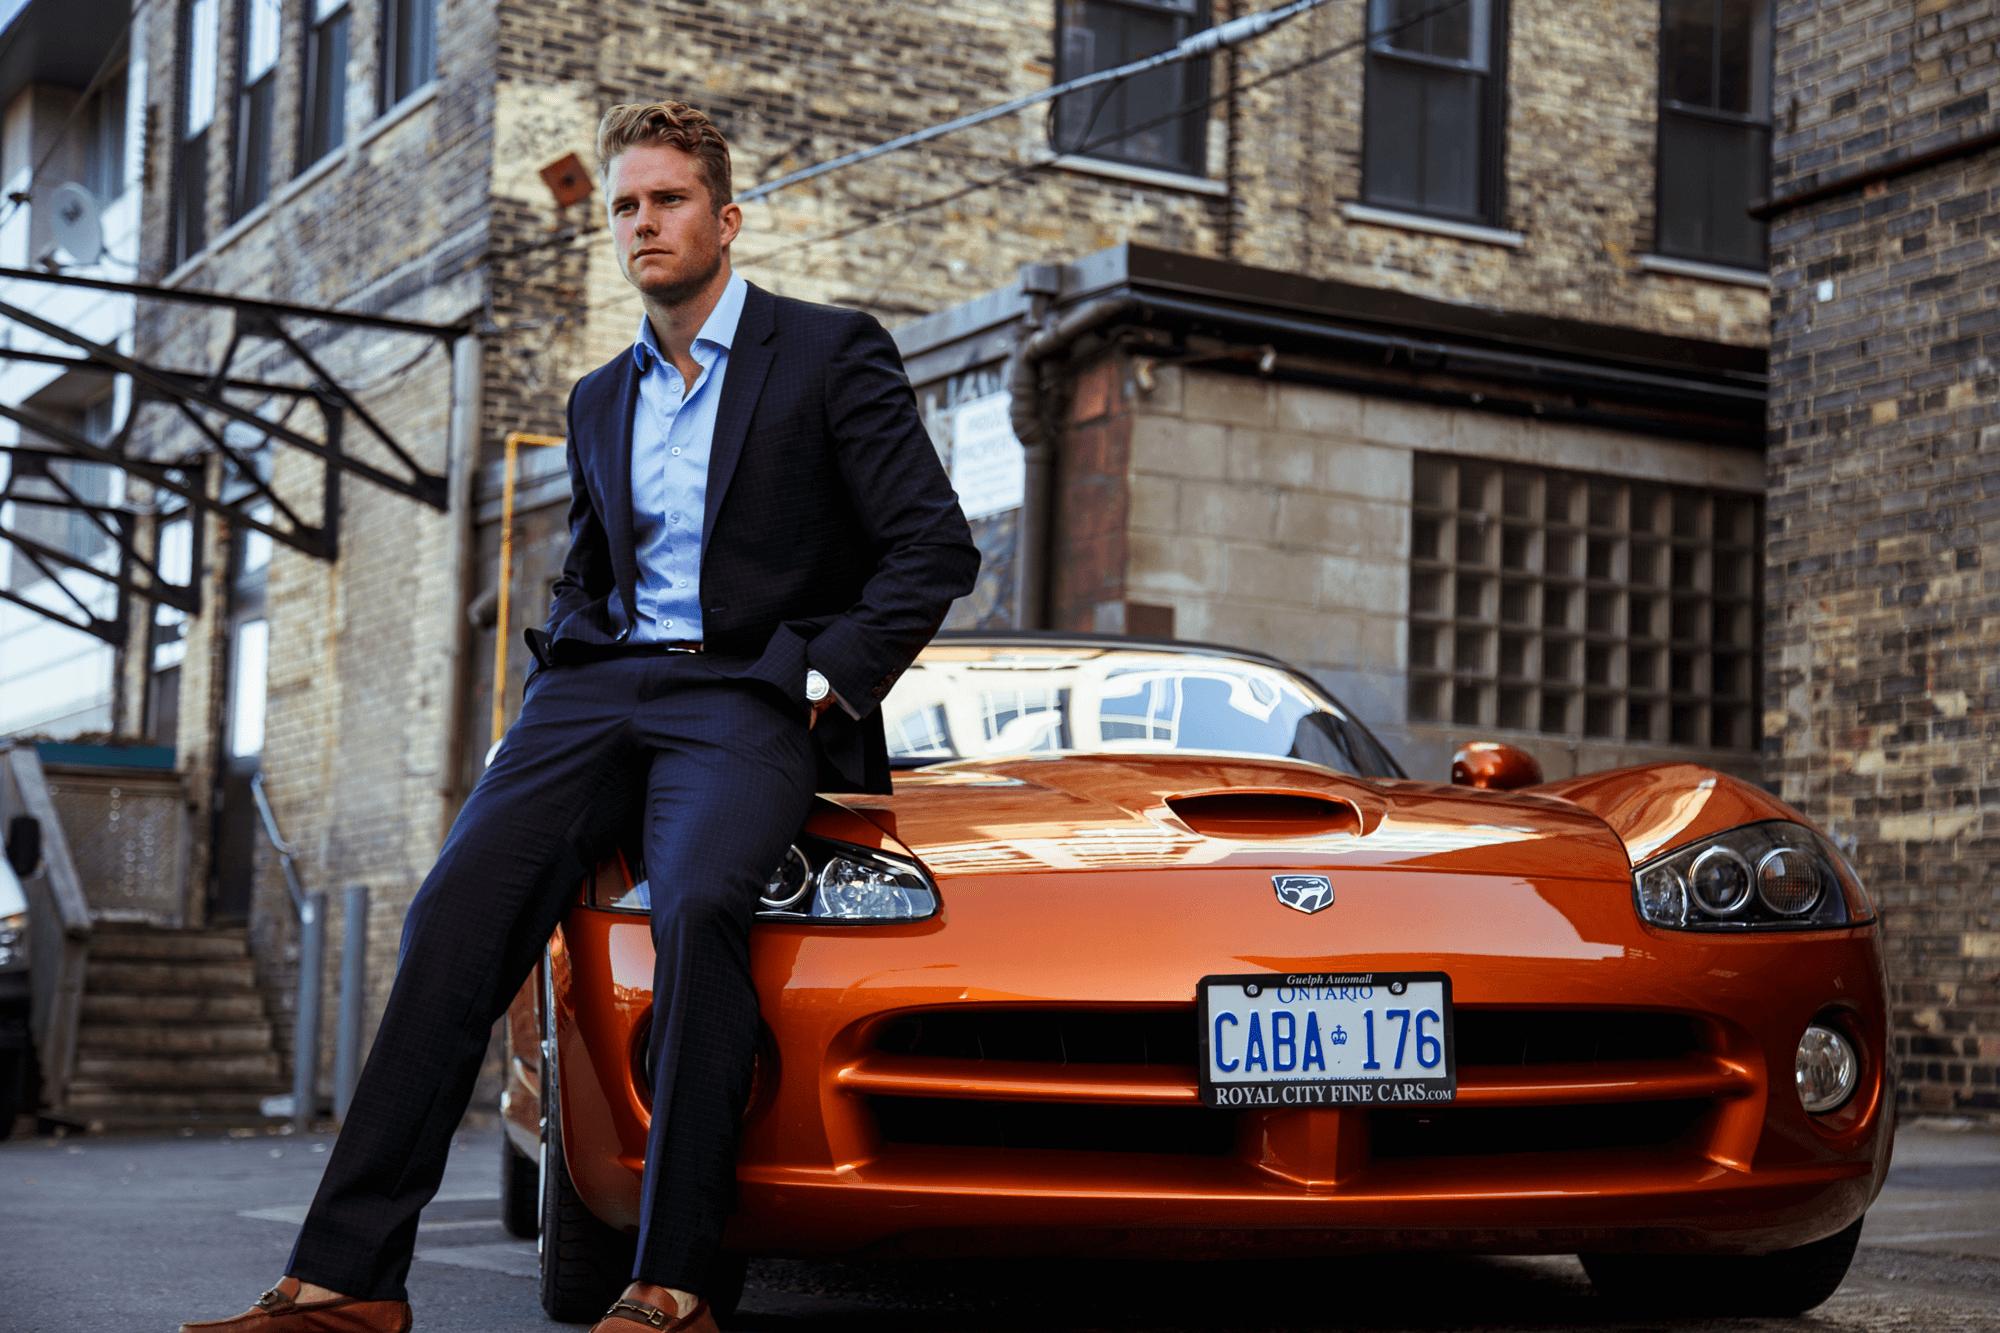 millenials mercado de carros premium